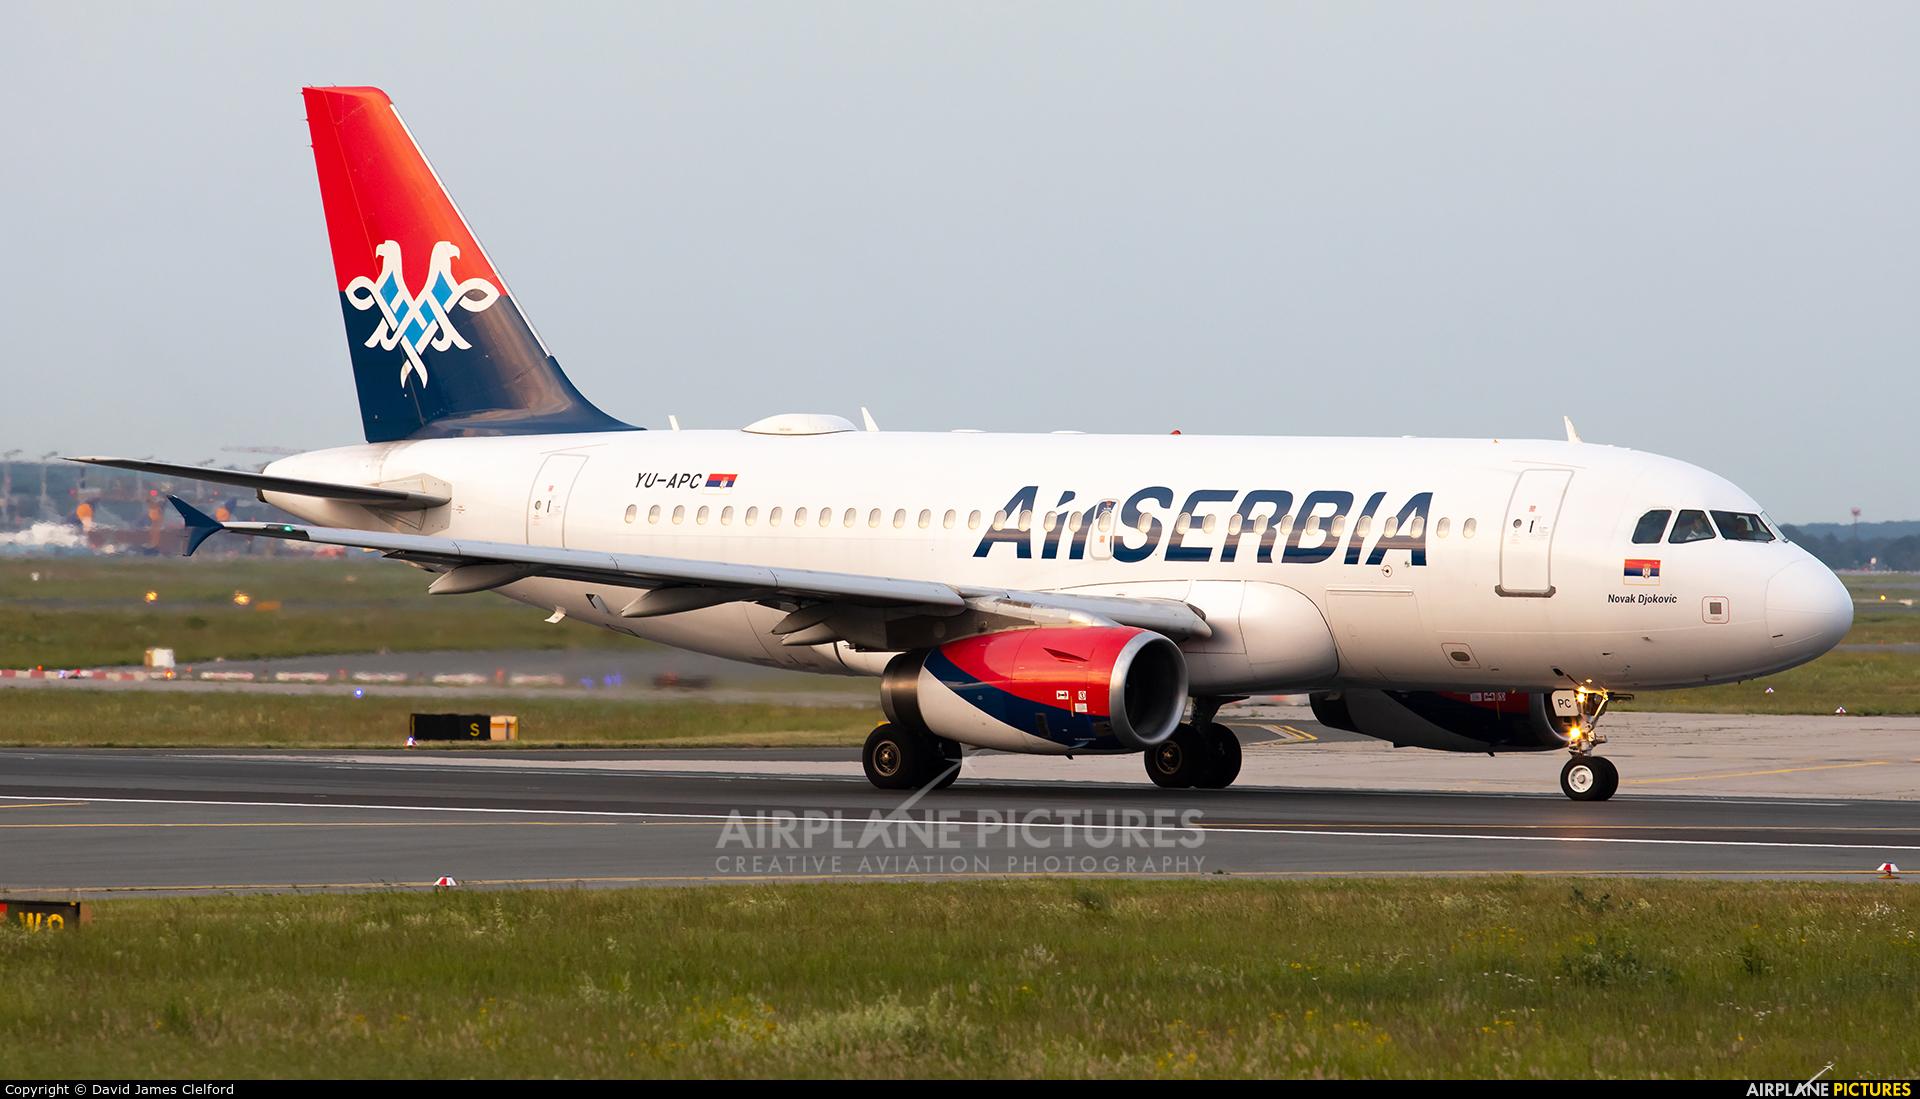 Air Serbia YU-APC aircraft at Frankfurt